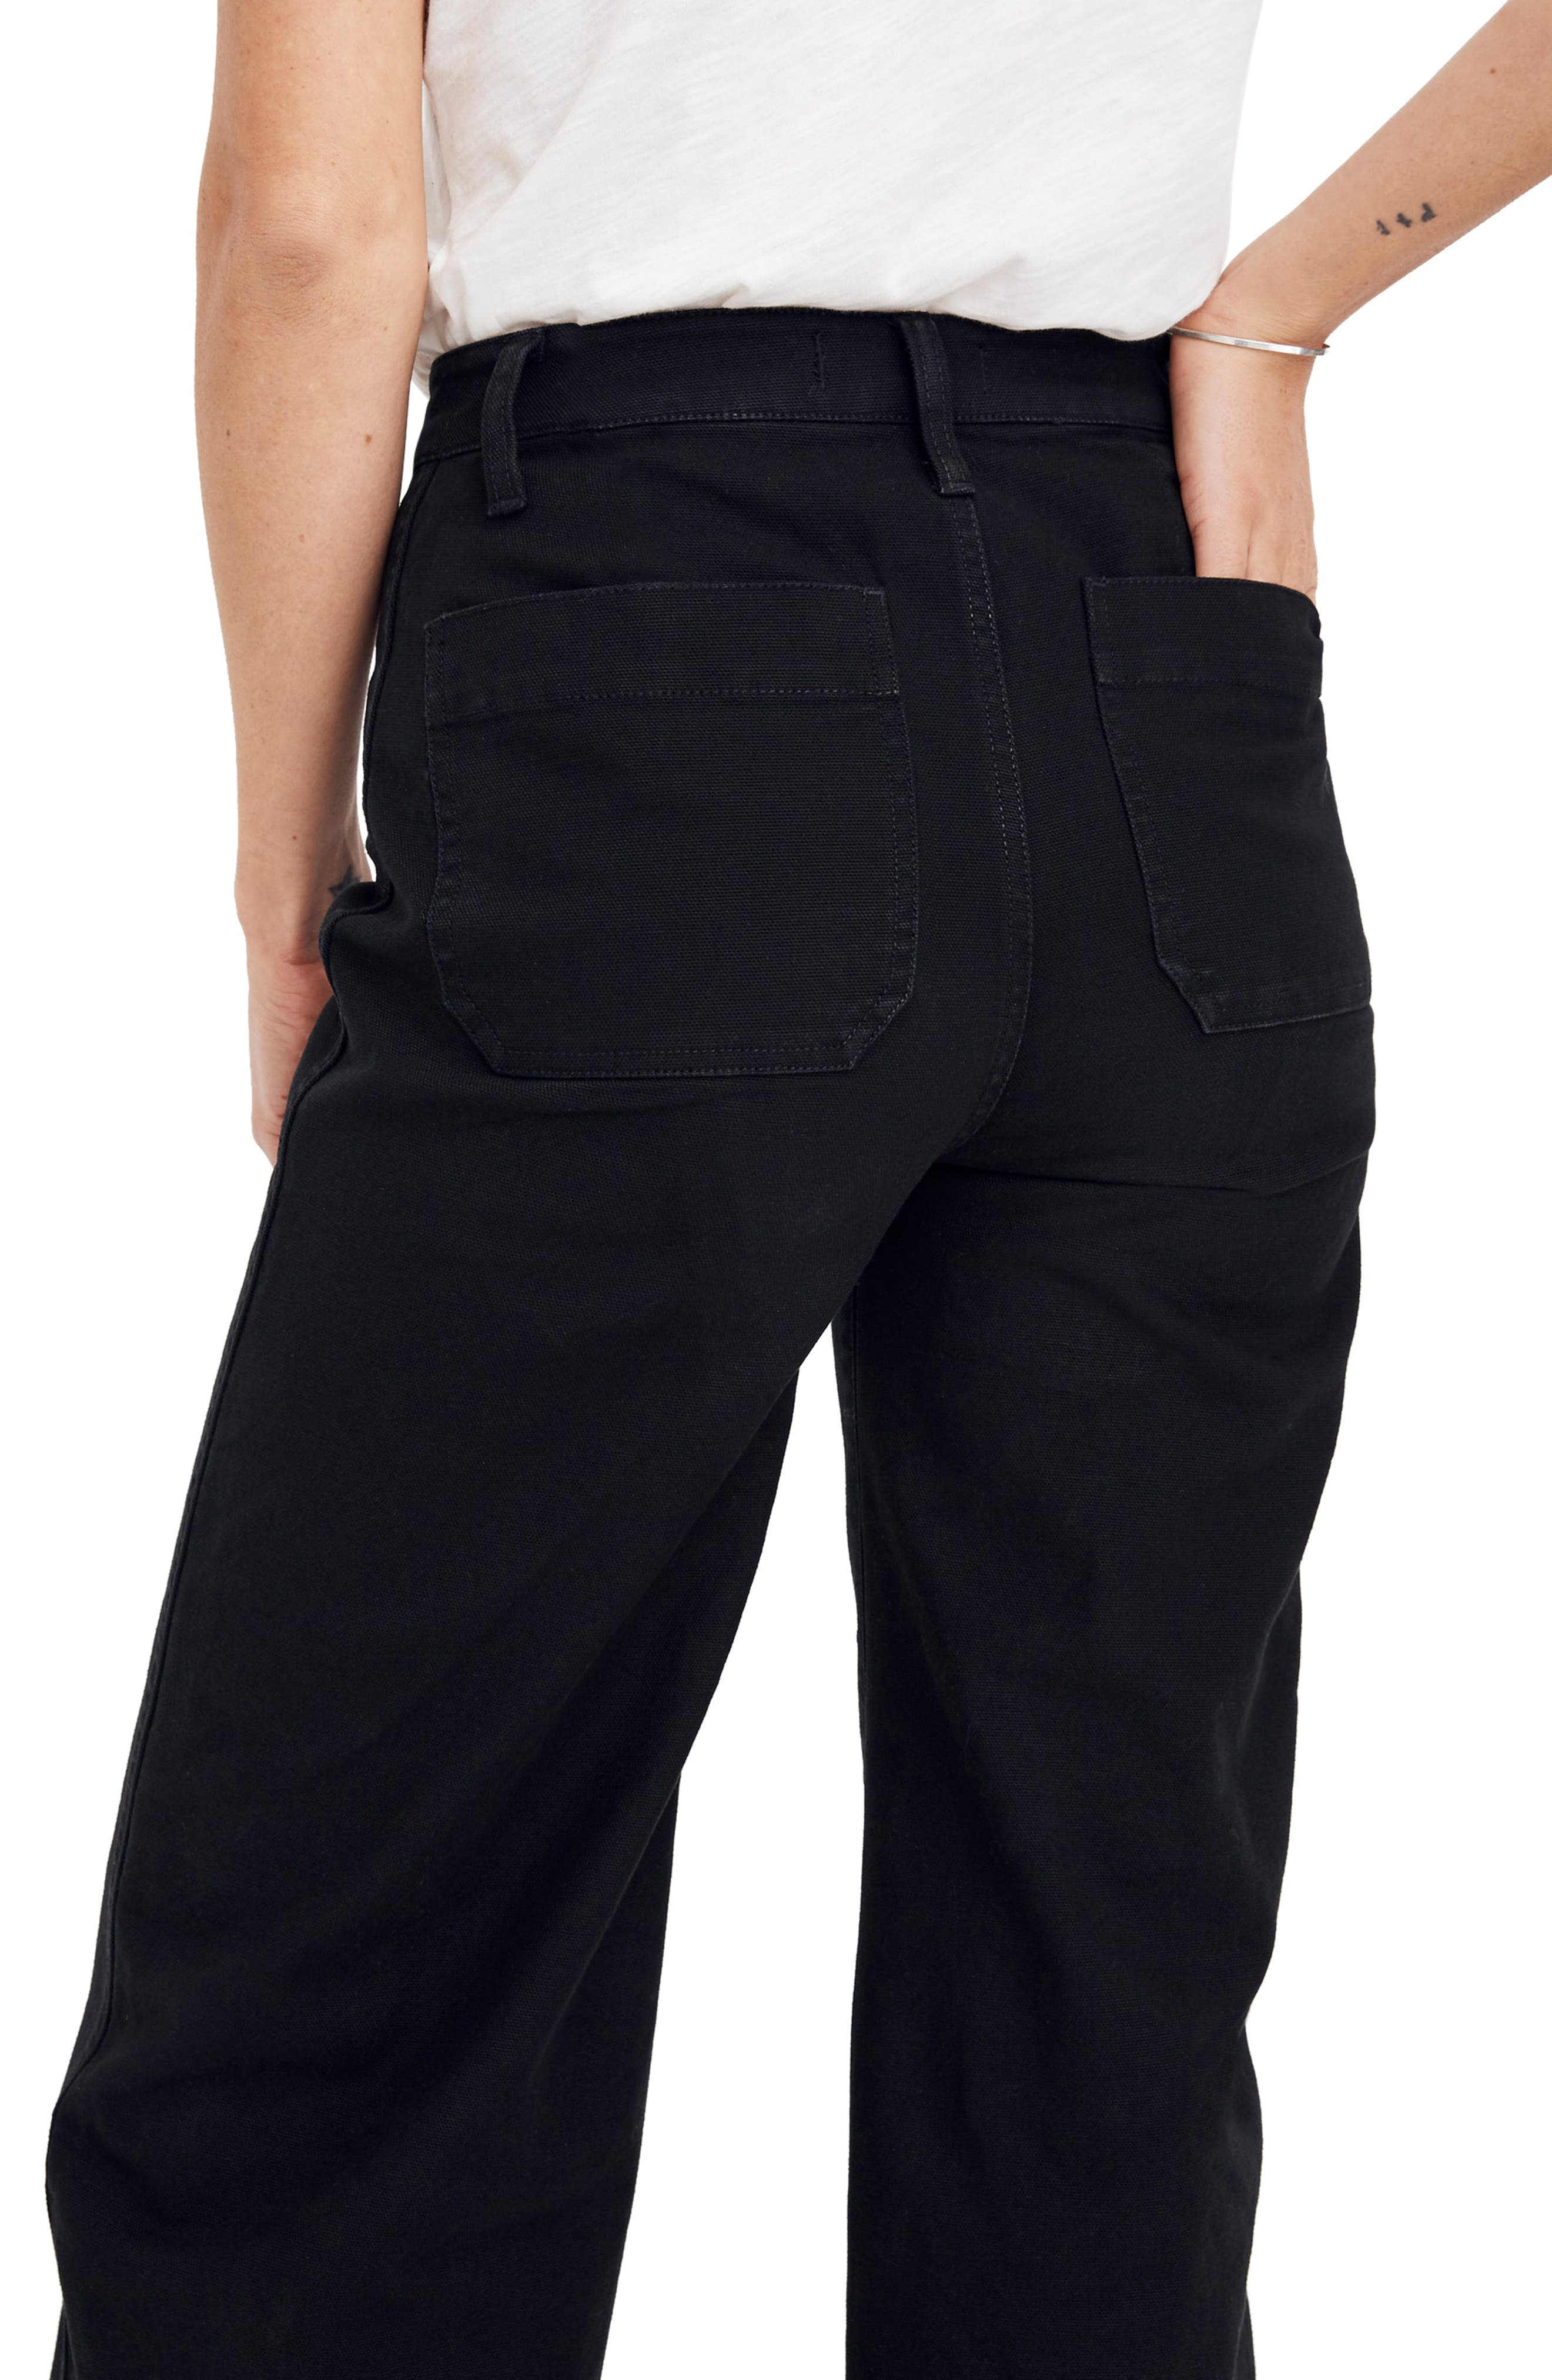 MADEWELL, Emmett Crop Wide Leg Pants, Alternate thumbnail 5, color, CLASSIC BLACK